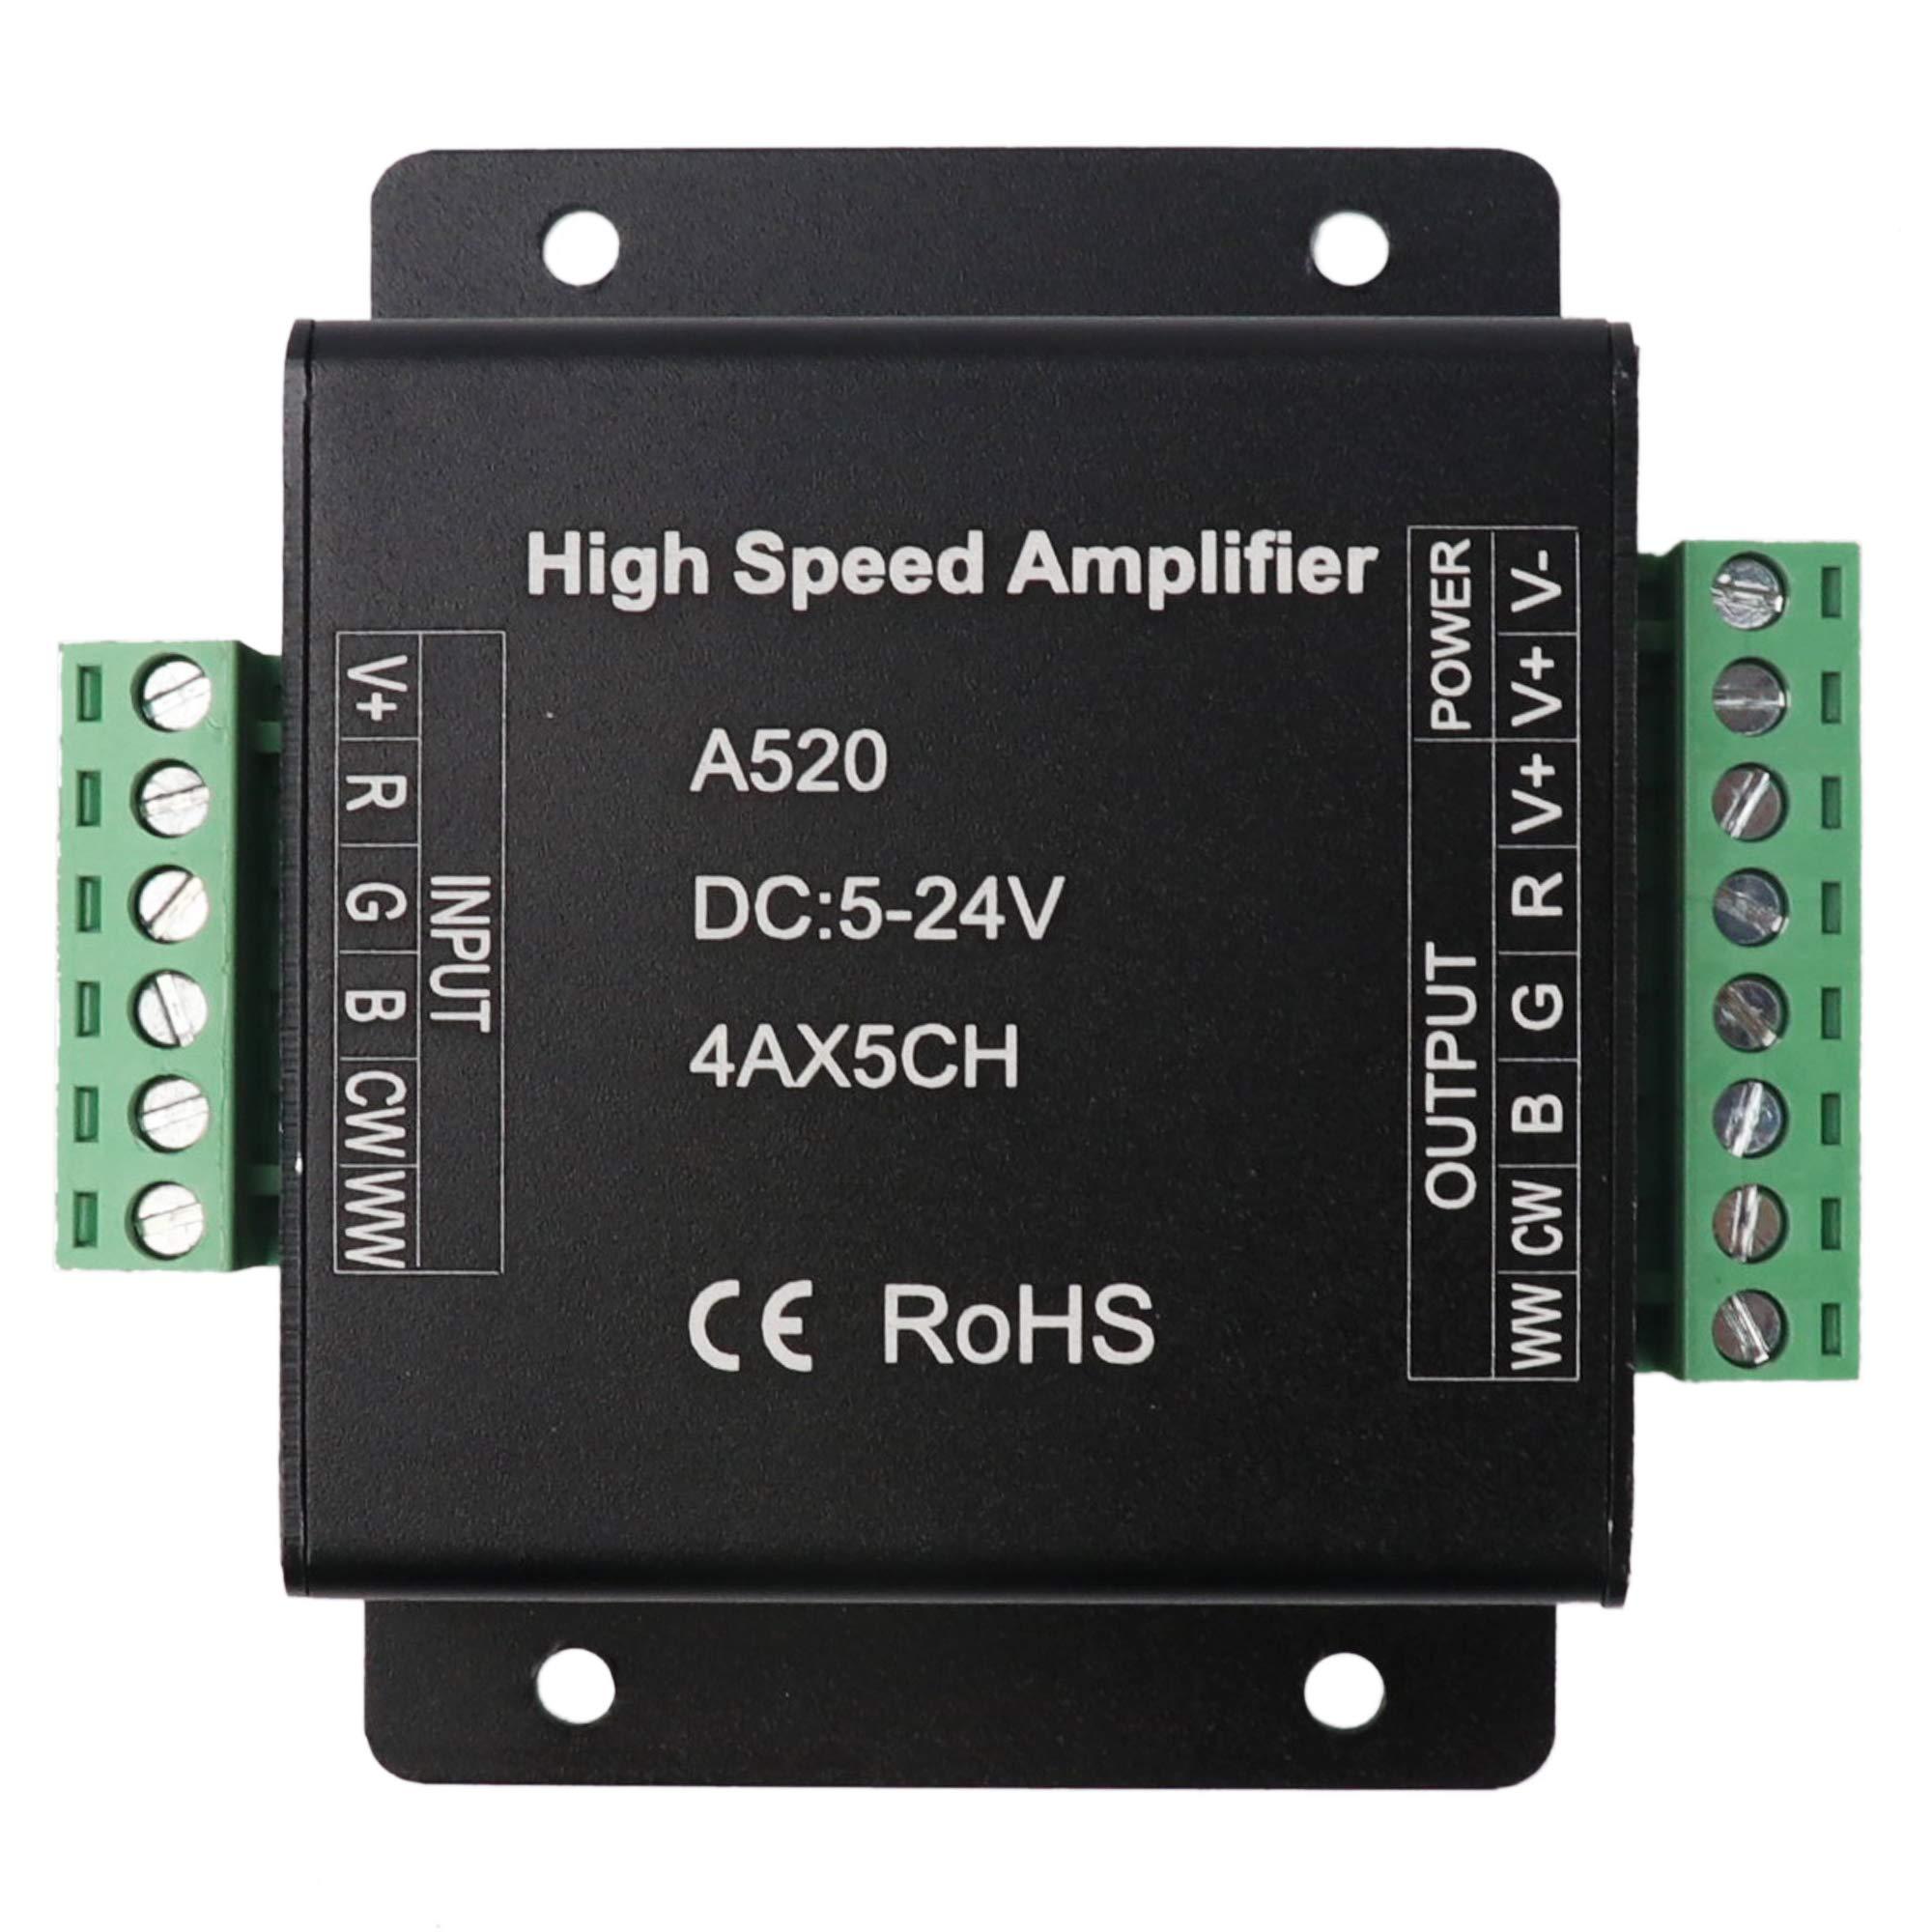 LEDENET RGB+CW+WW Amplifier 20A Data Signal Repeater 5CH Channels Circuit Aluminum Shell For RGB+W+WW LED Lights Strip 5V 12V 24V